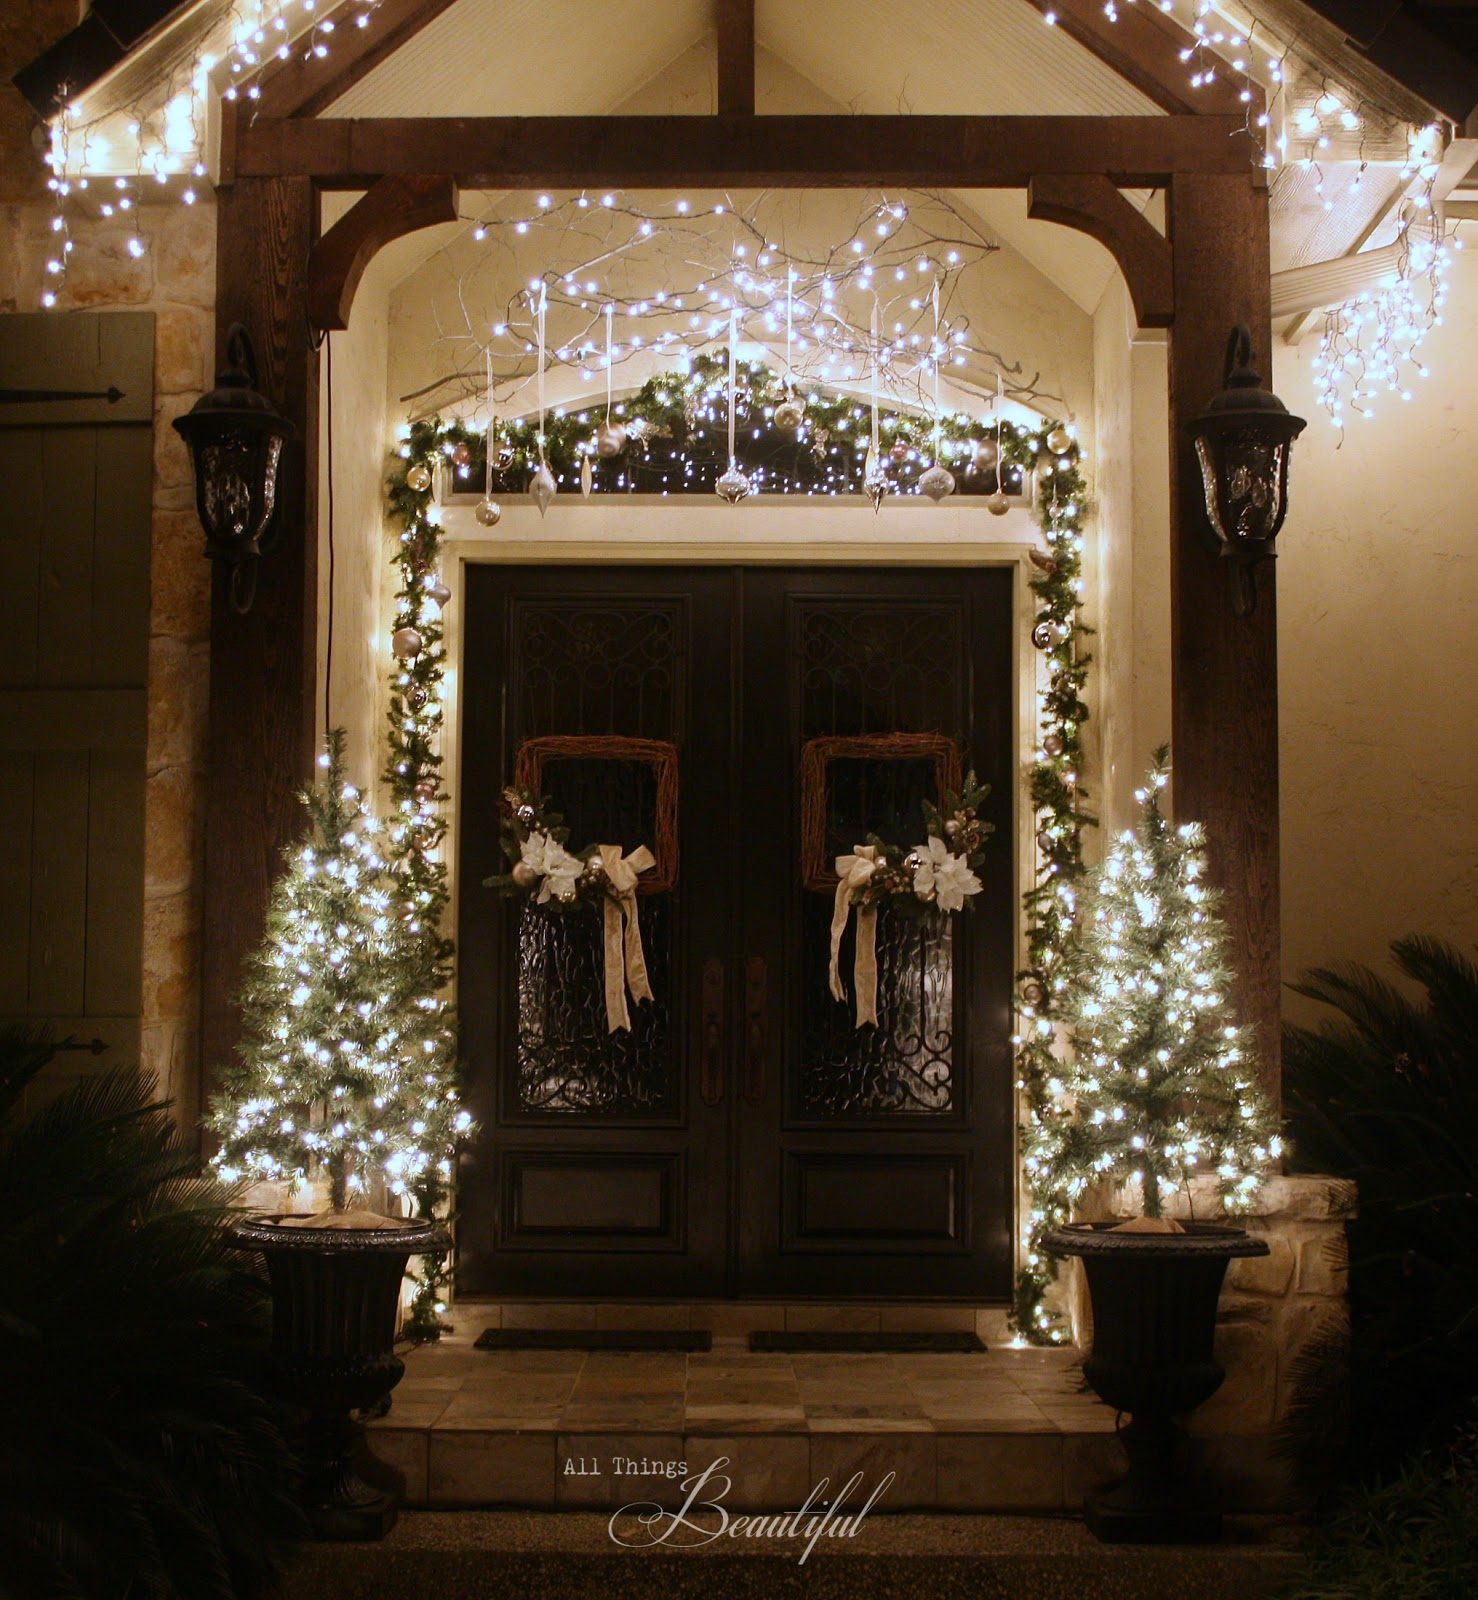 All Things Beautiful: Christmas Porch {Garland}